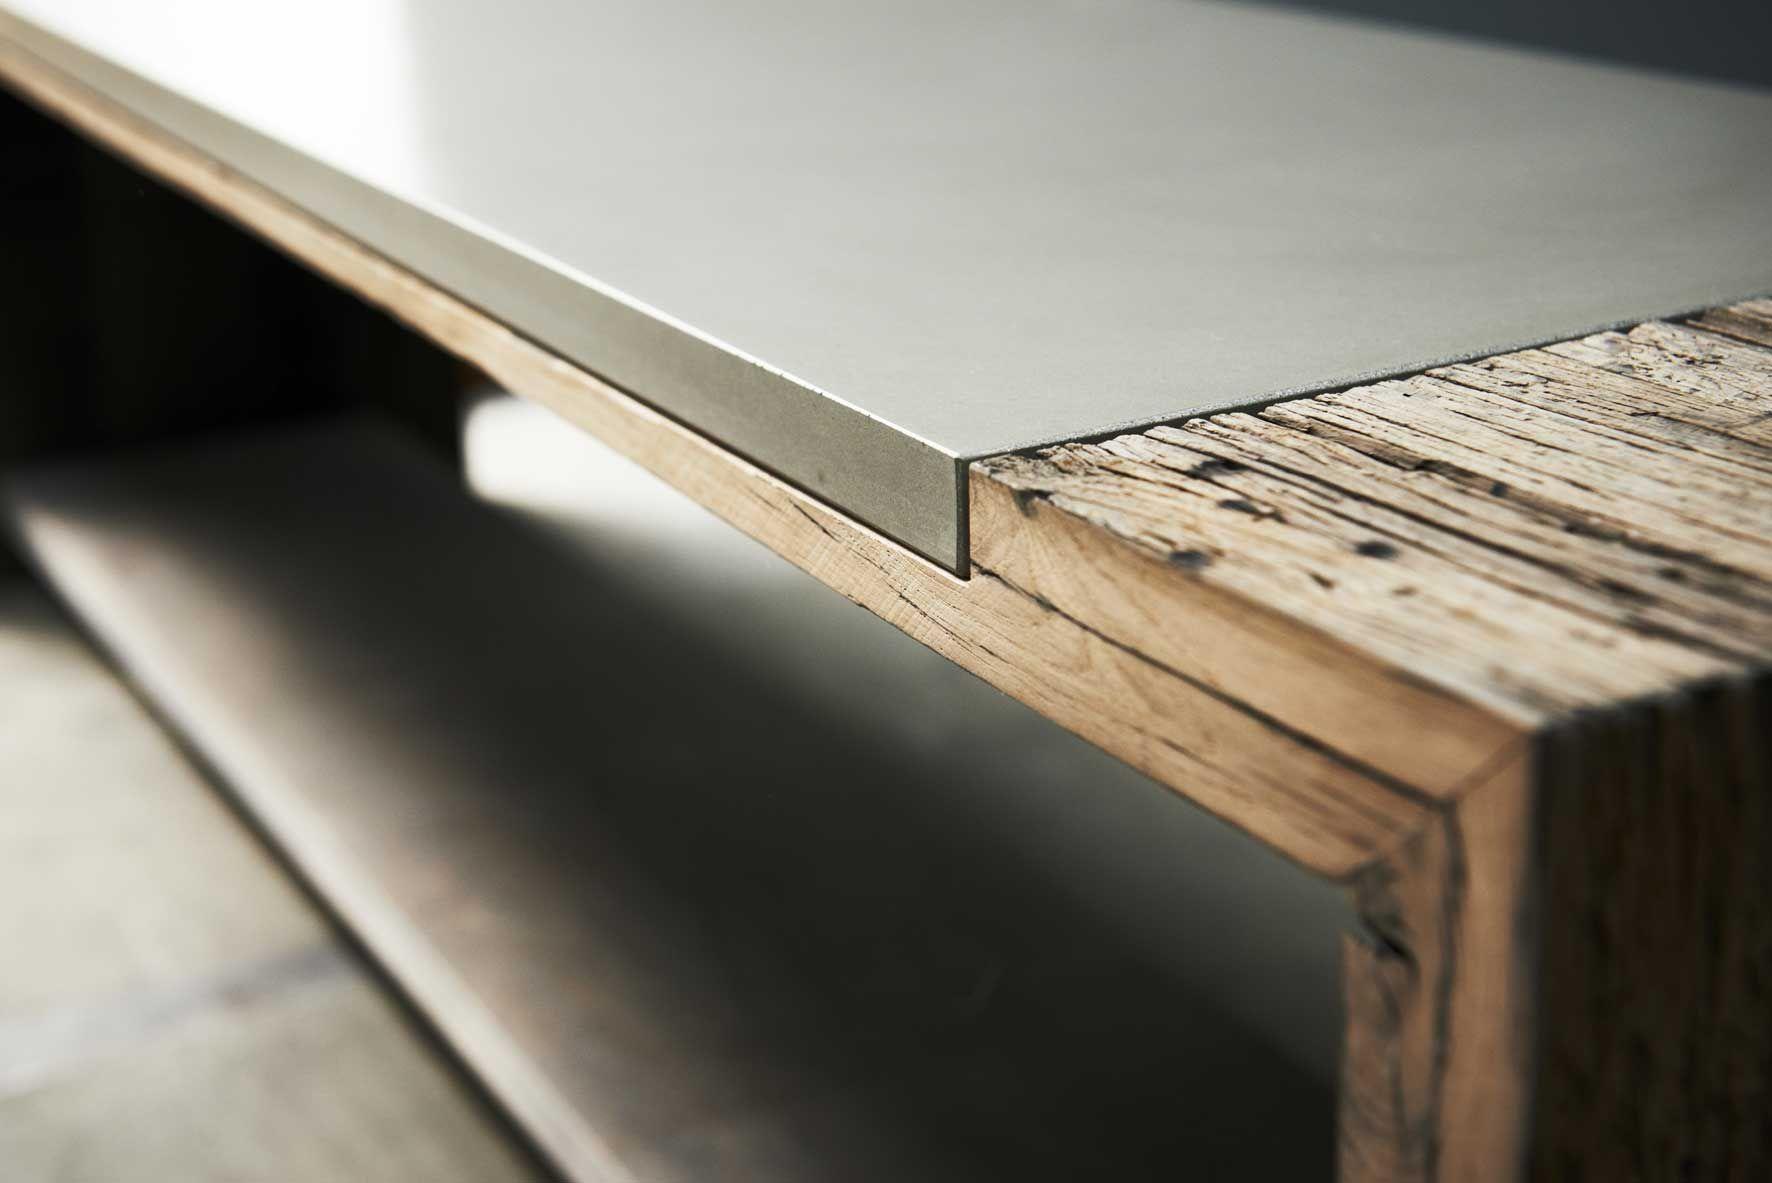 Produktdesign Möbel beton möbel beton concrete home design stilvolle